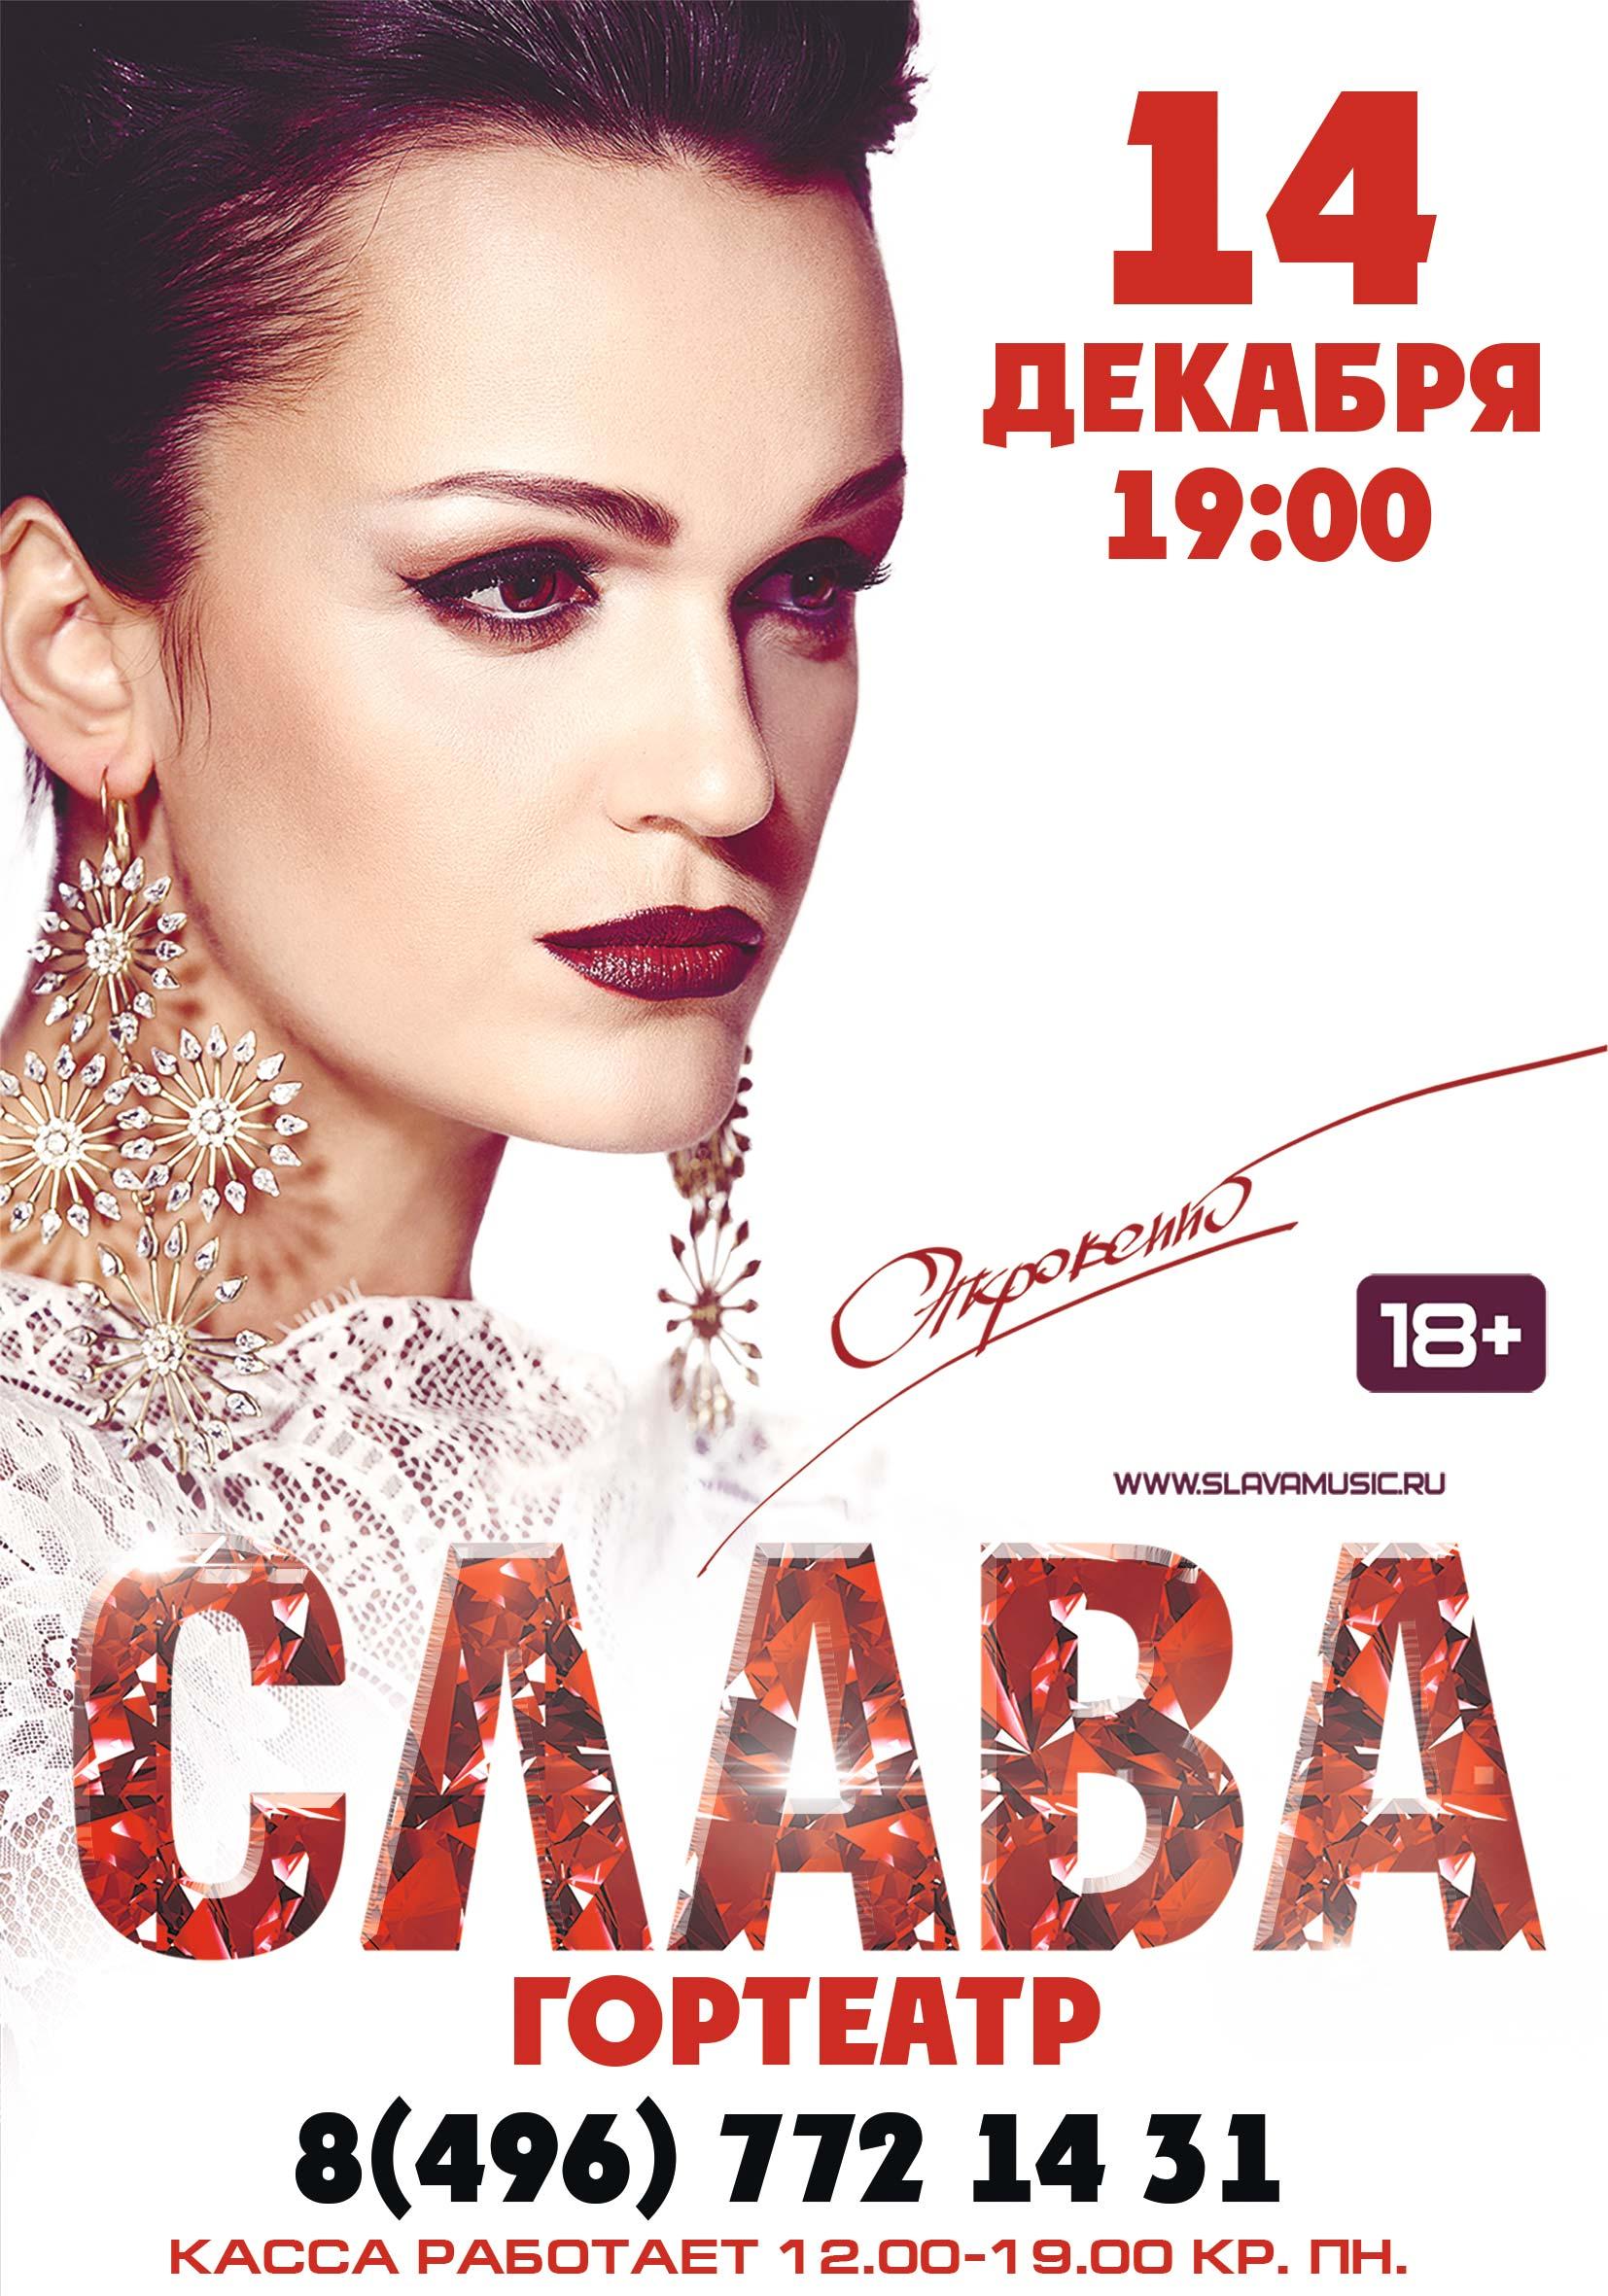 Slava_A2_D14_dekabrya_gorteatr_1